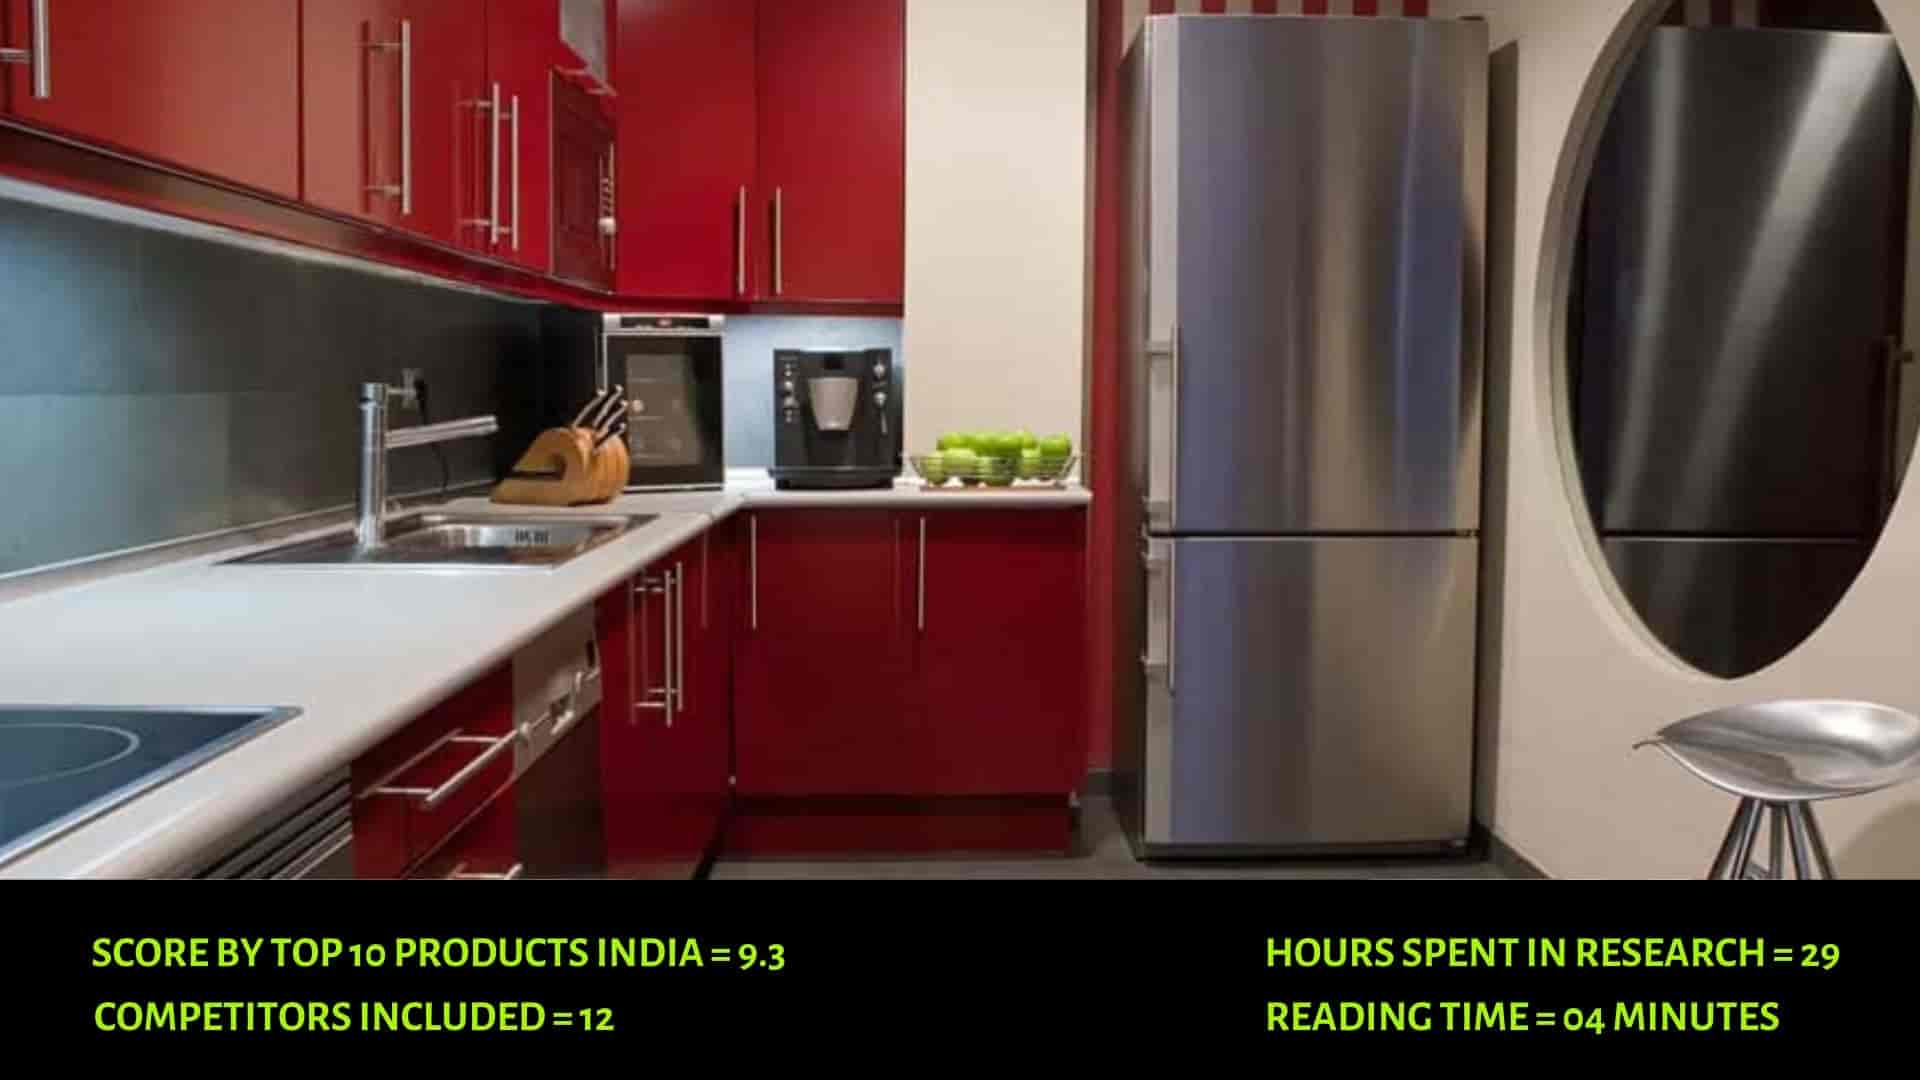 Voltas Beko Refrigerator Review 2021: BUY IT OR NOT?